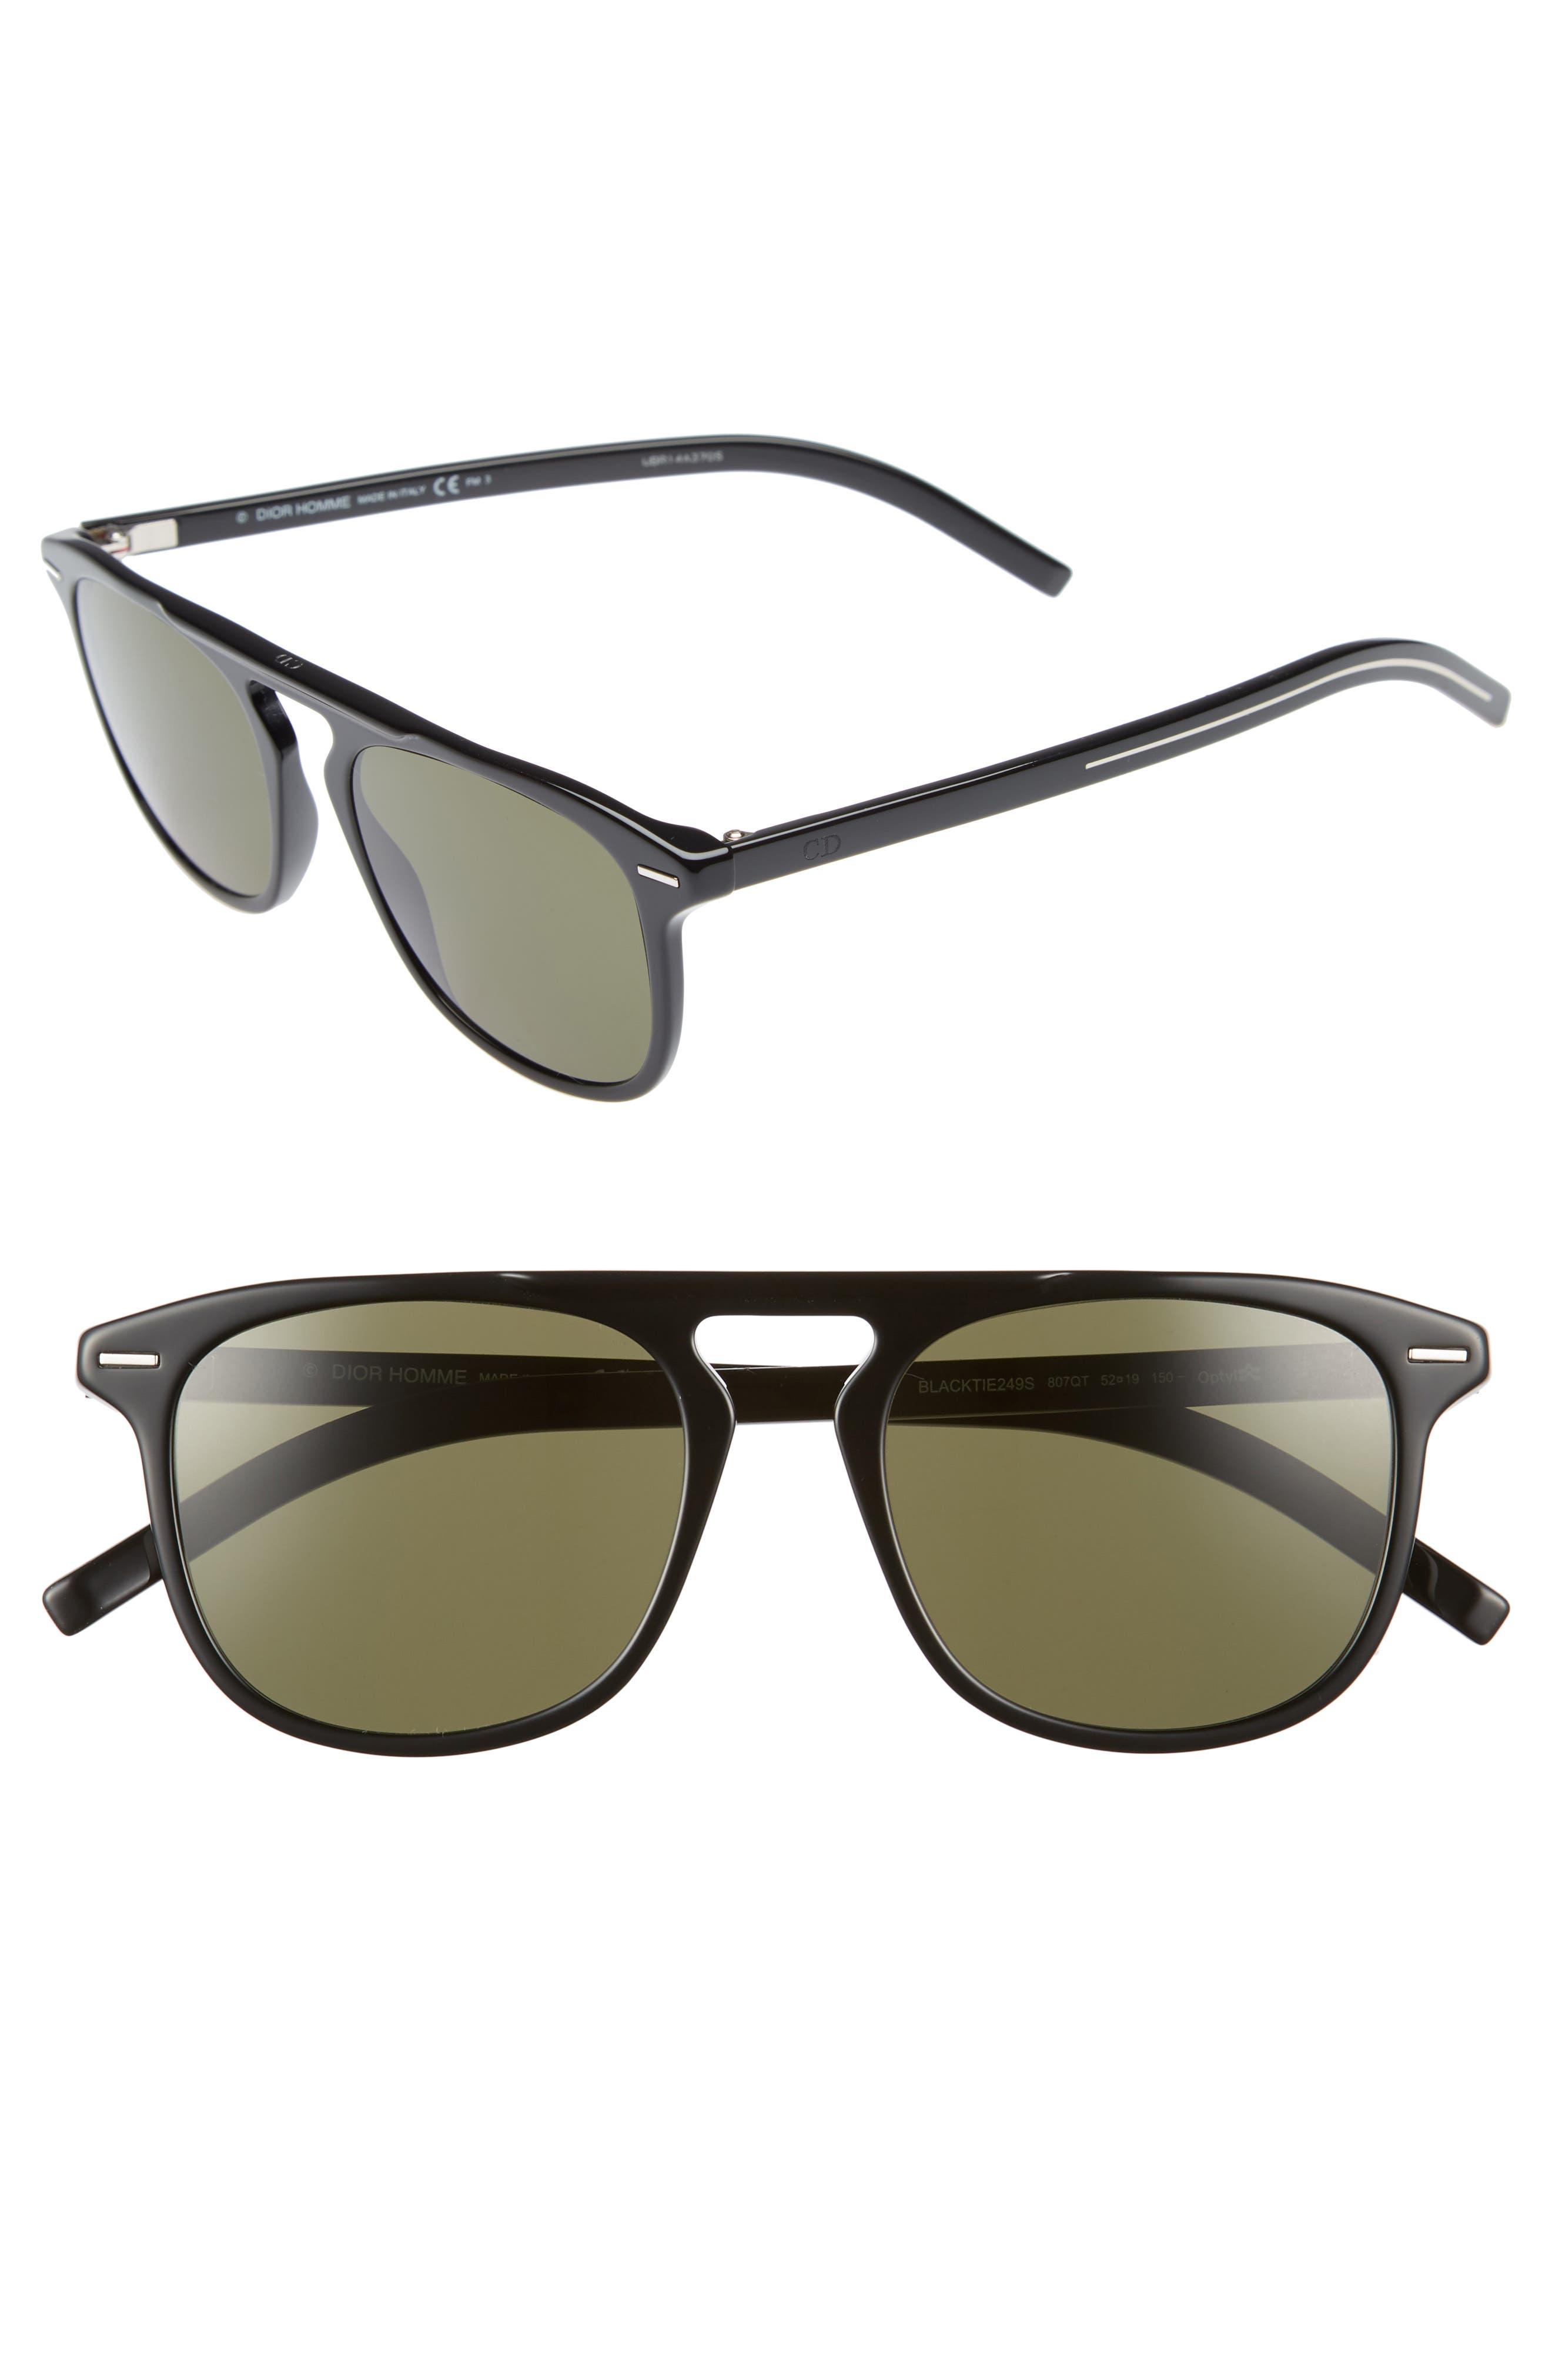 52mm Sunglasses,                         Main,                         color, 001